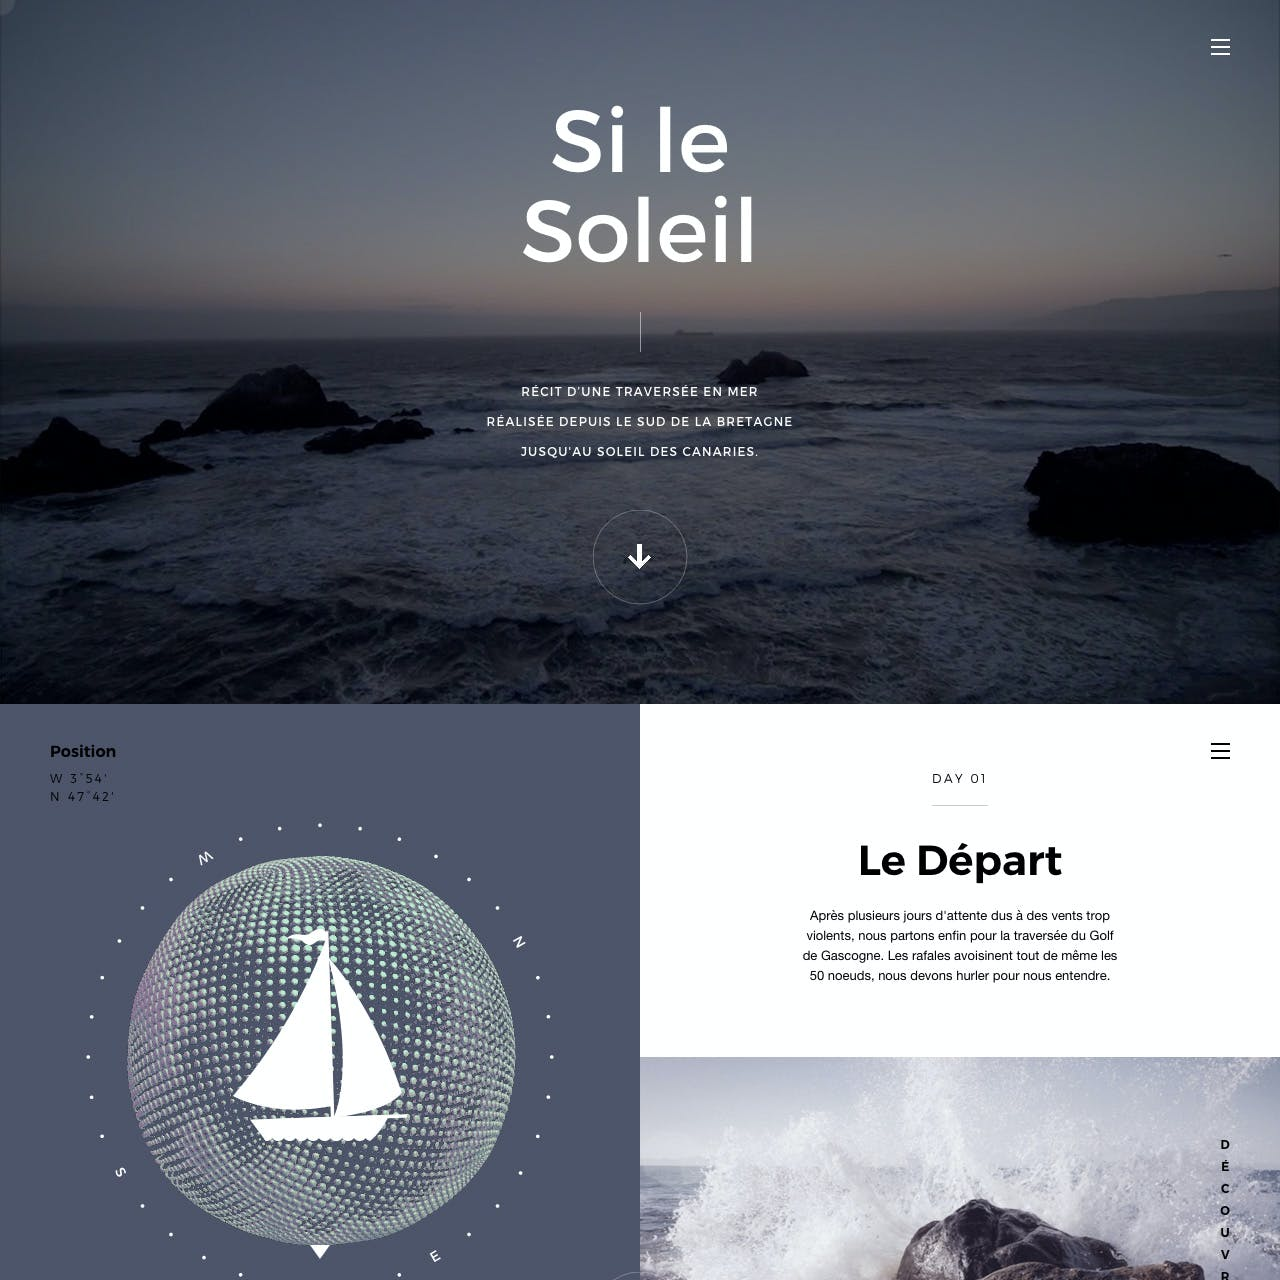 Si Le Soleil Website Screenshot